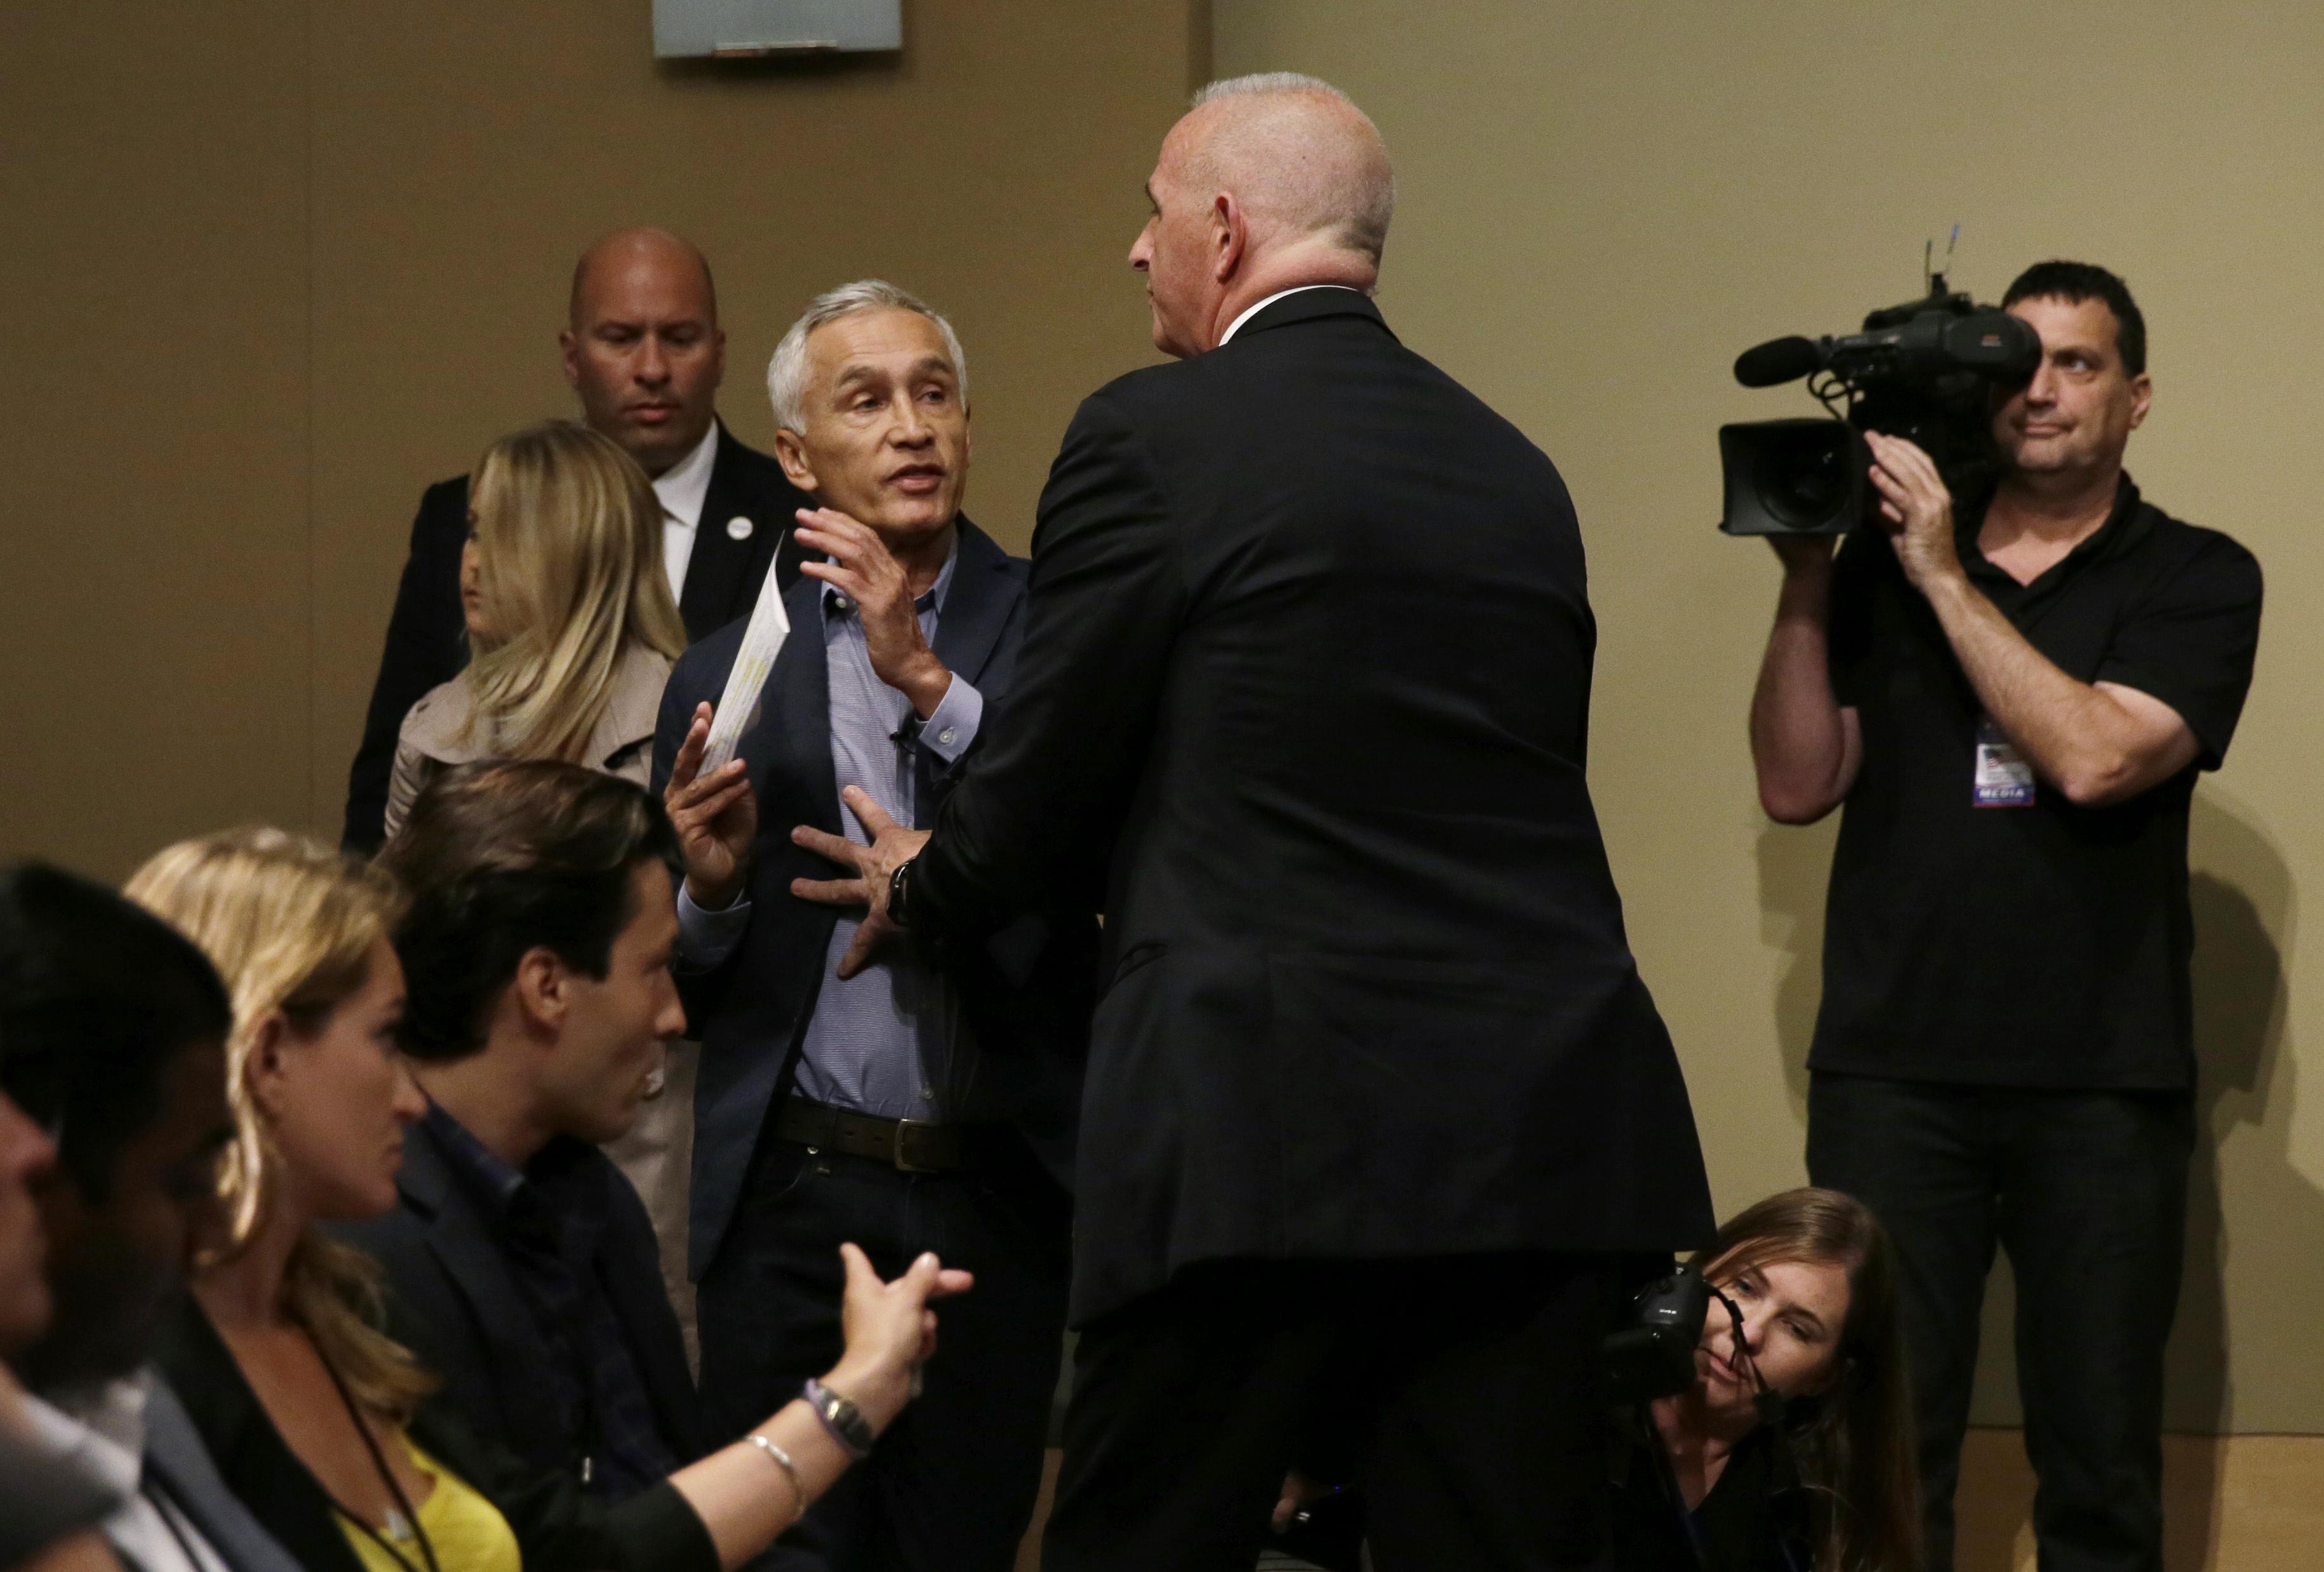 Univision's Jorge Ramos: Journalists Must 'Denounce' Trump's 'Dangerous Words'